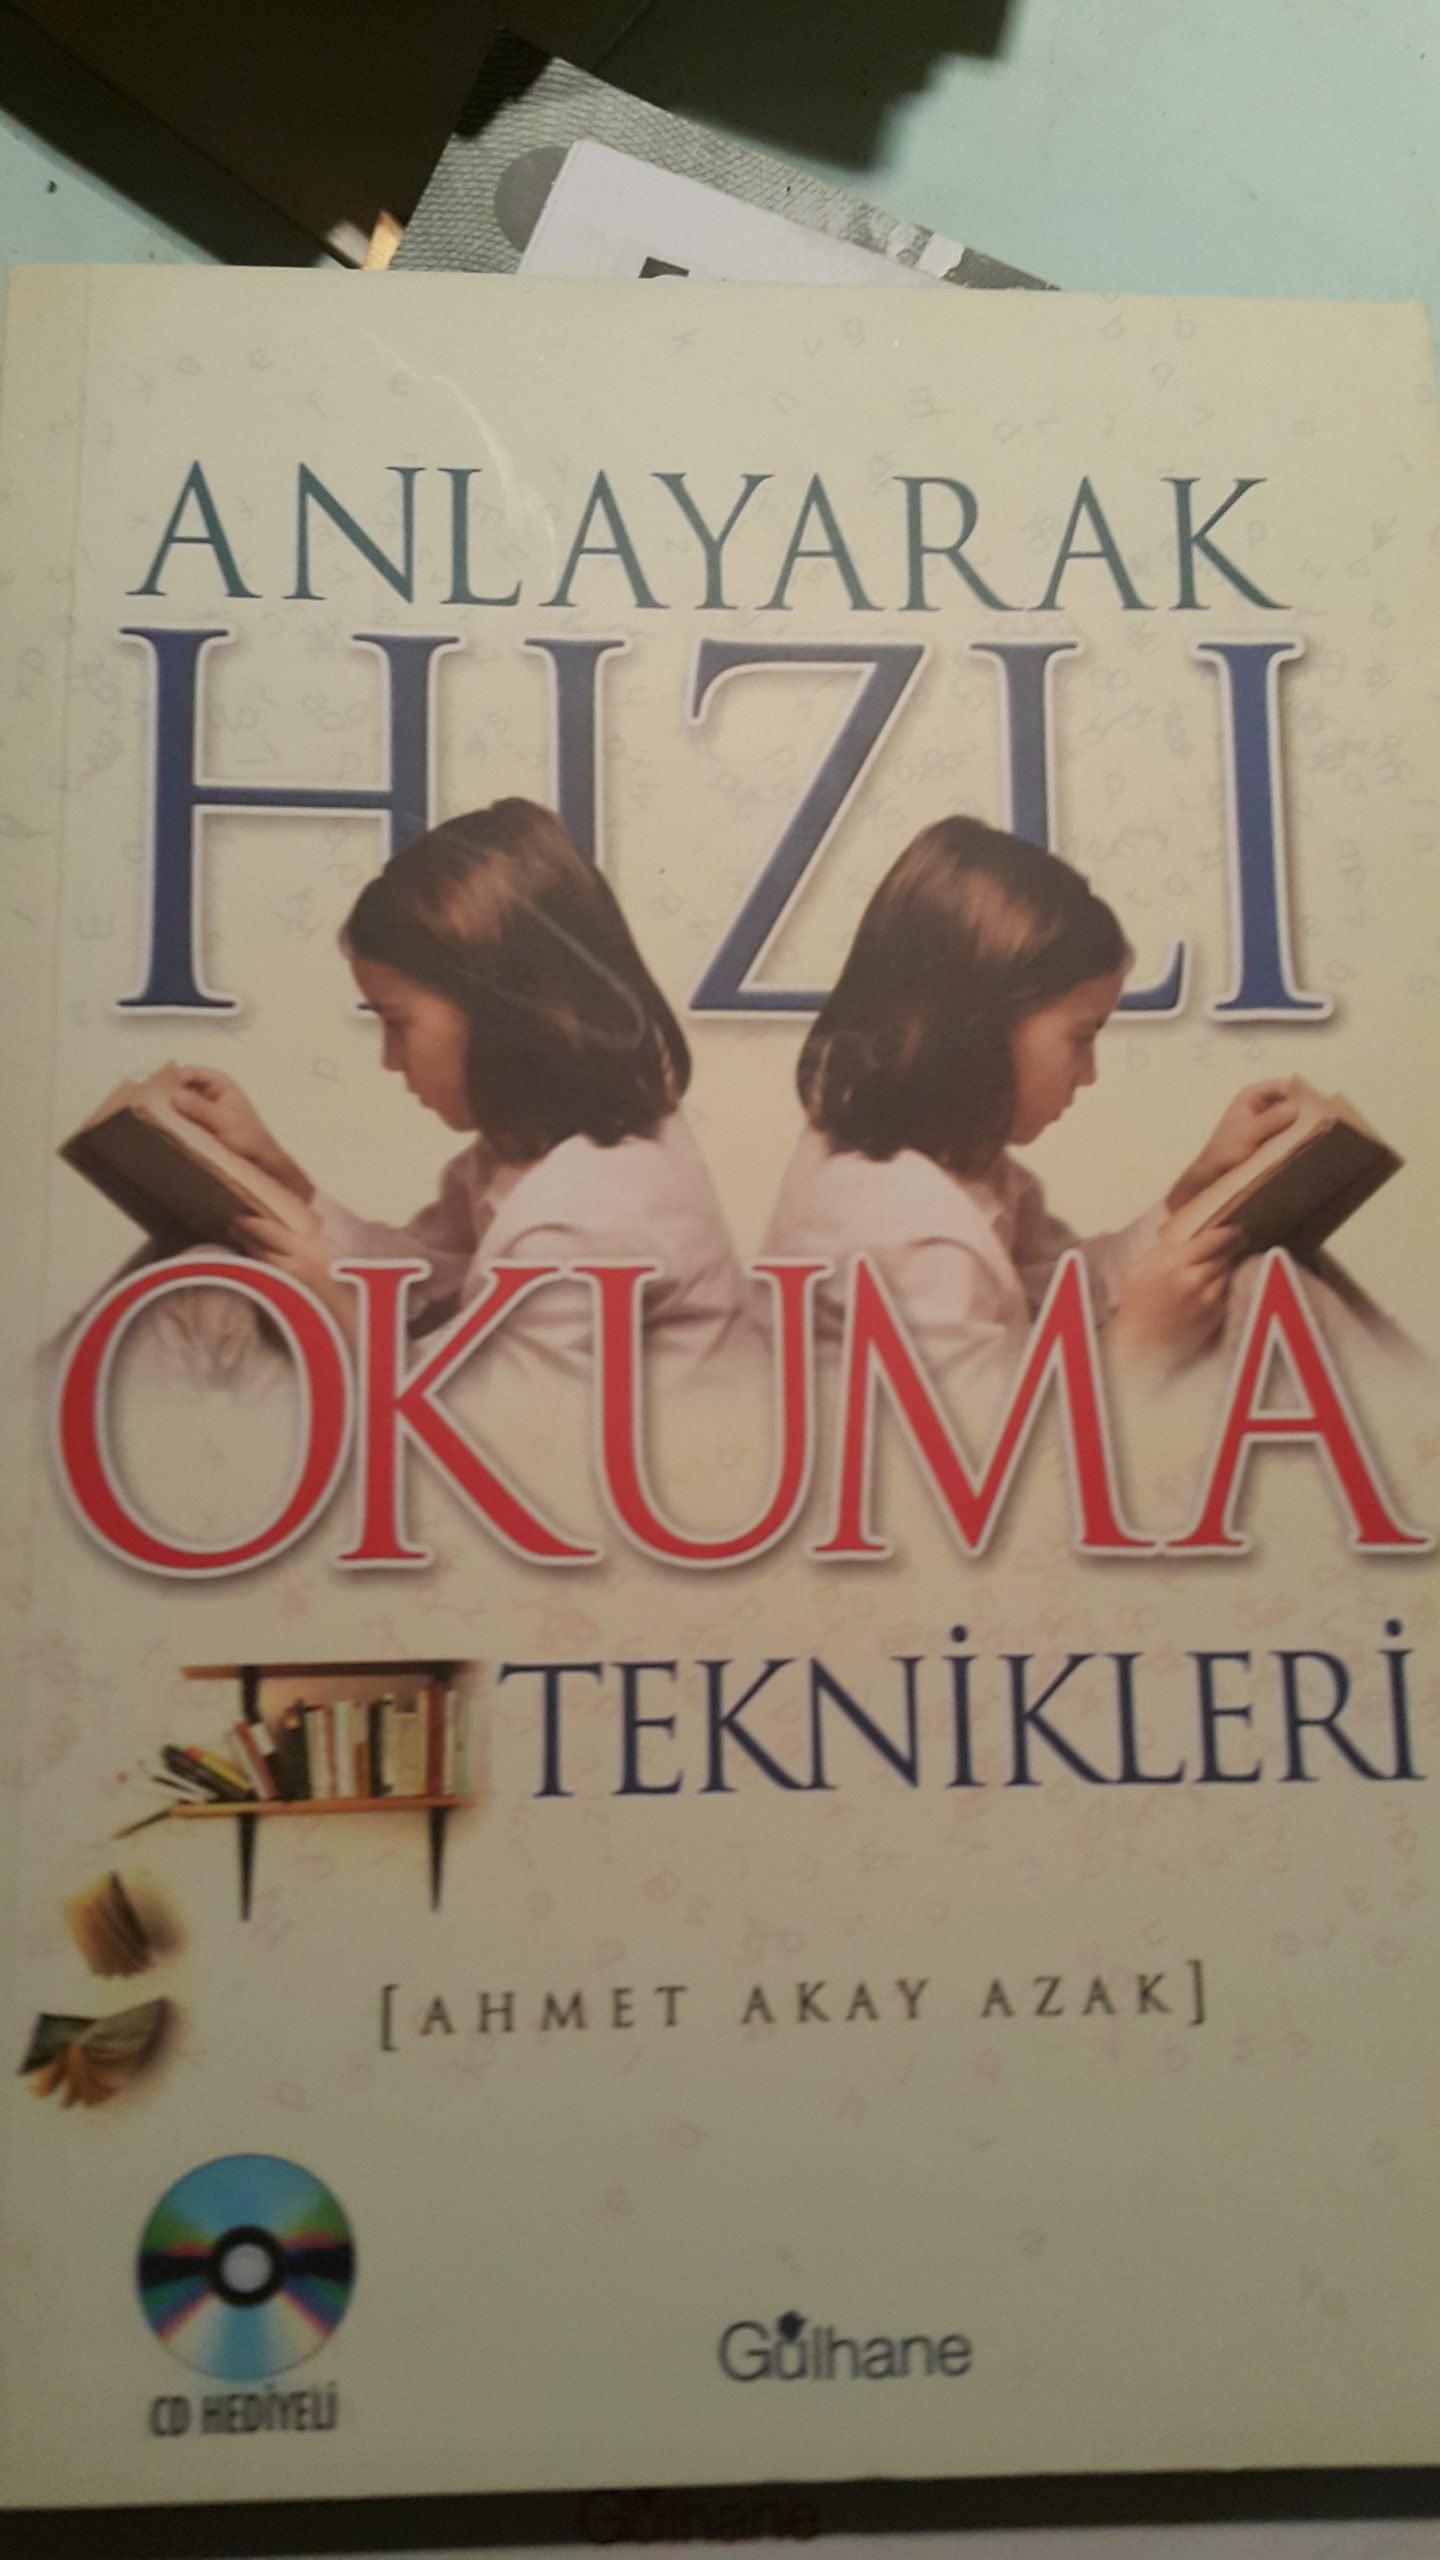 ANLAYARAK HIZLI OKUMA TEKNİKLERİ/AHMET AKAY